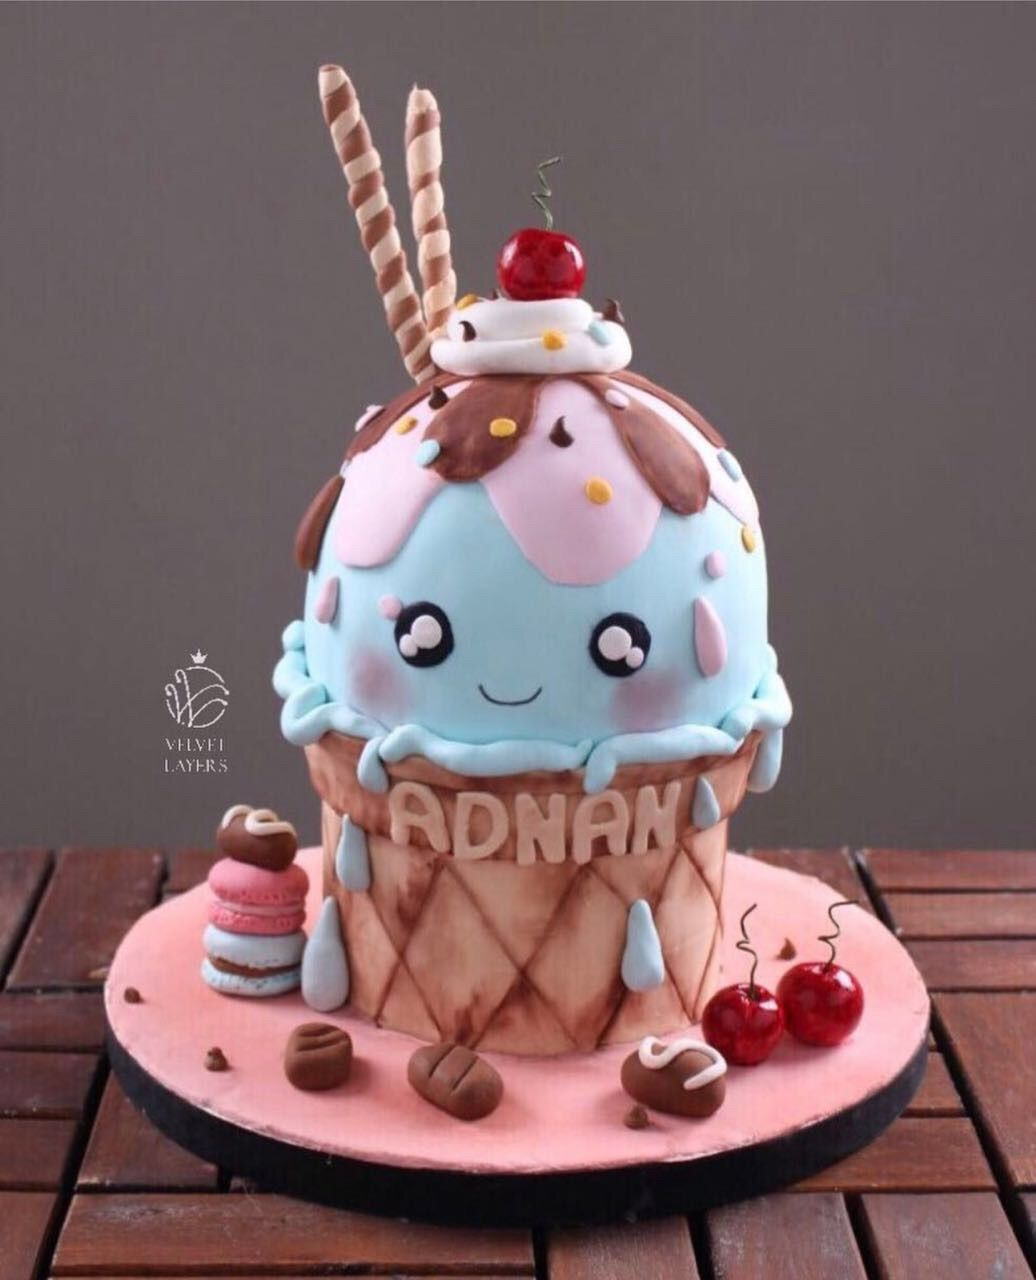 Astonishing Birthday Girl Ice Cream Birthday Party Ice Cream Cone Cake Ice Funny Birthday Cards Online Fluifree Goldxyz